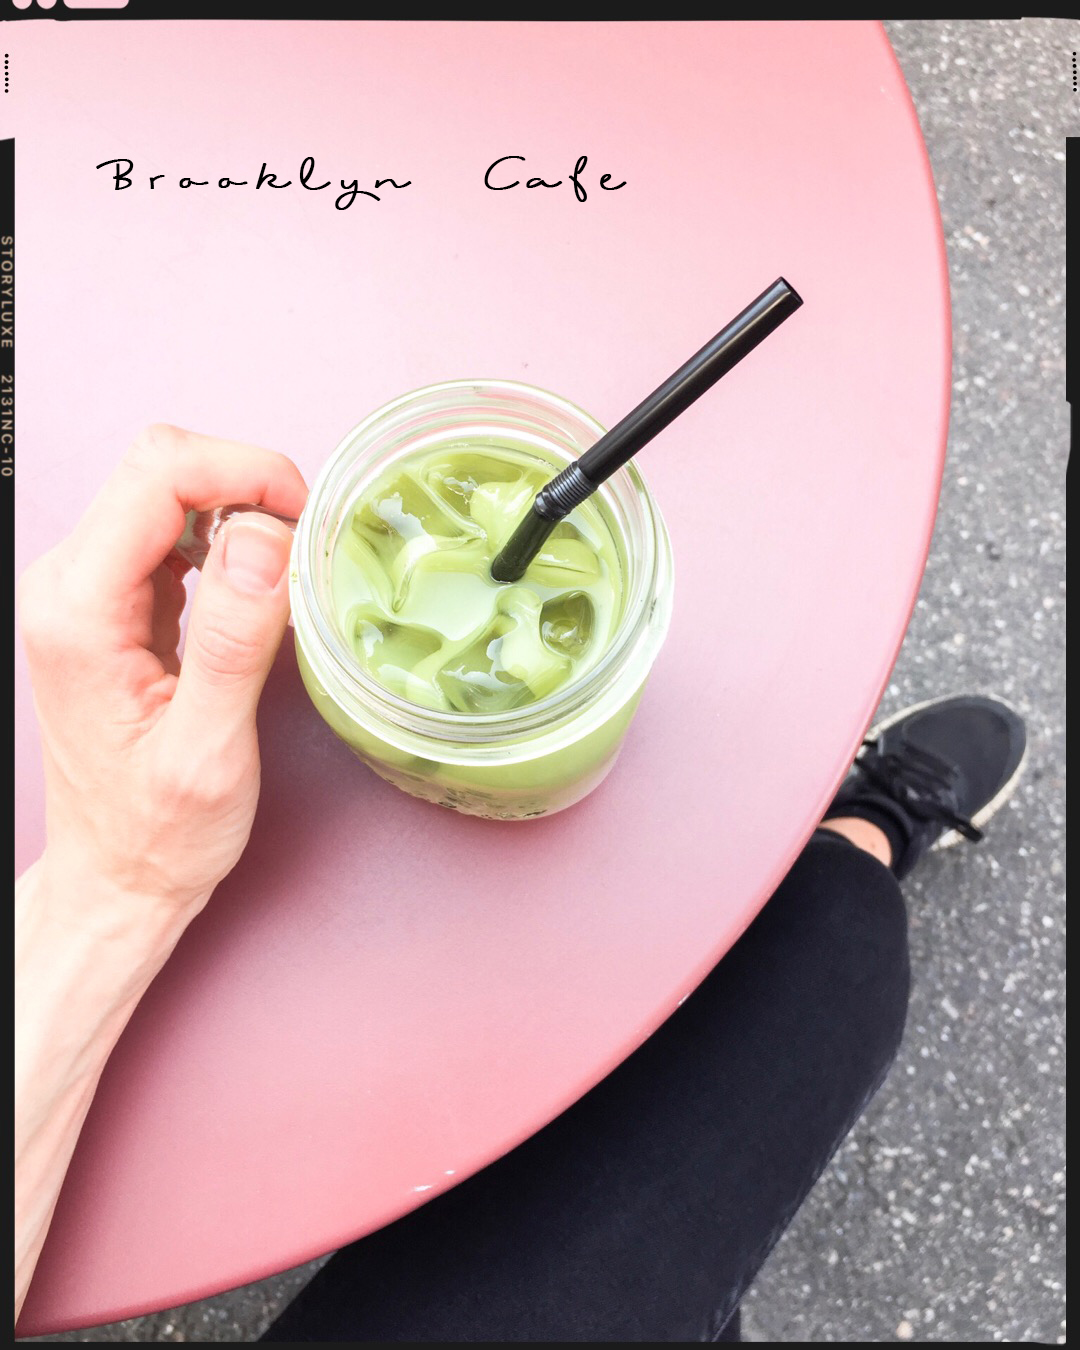 Helsinki Coffee Guide / Kahvilavinkit Helsinkiin: Brooklyn Cafe + iced matcha latte